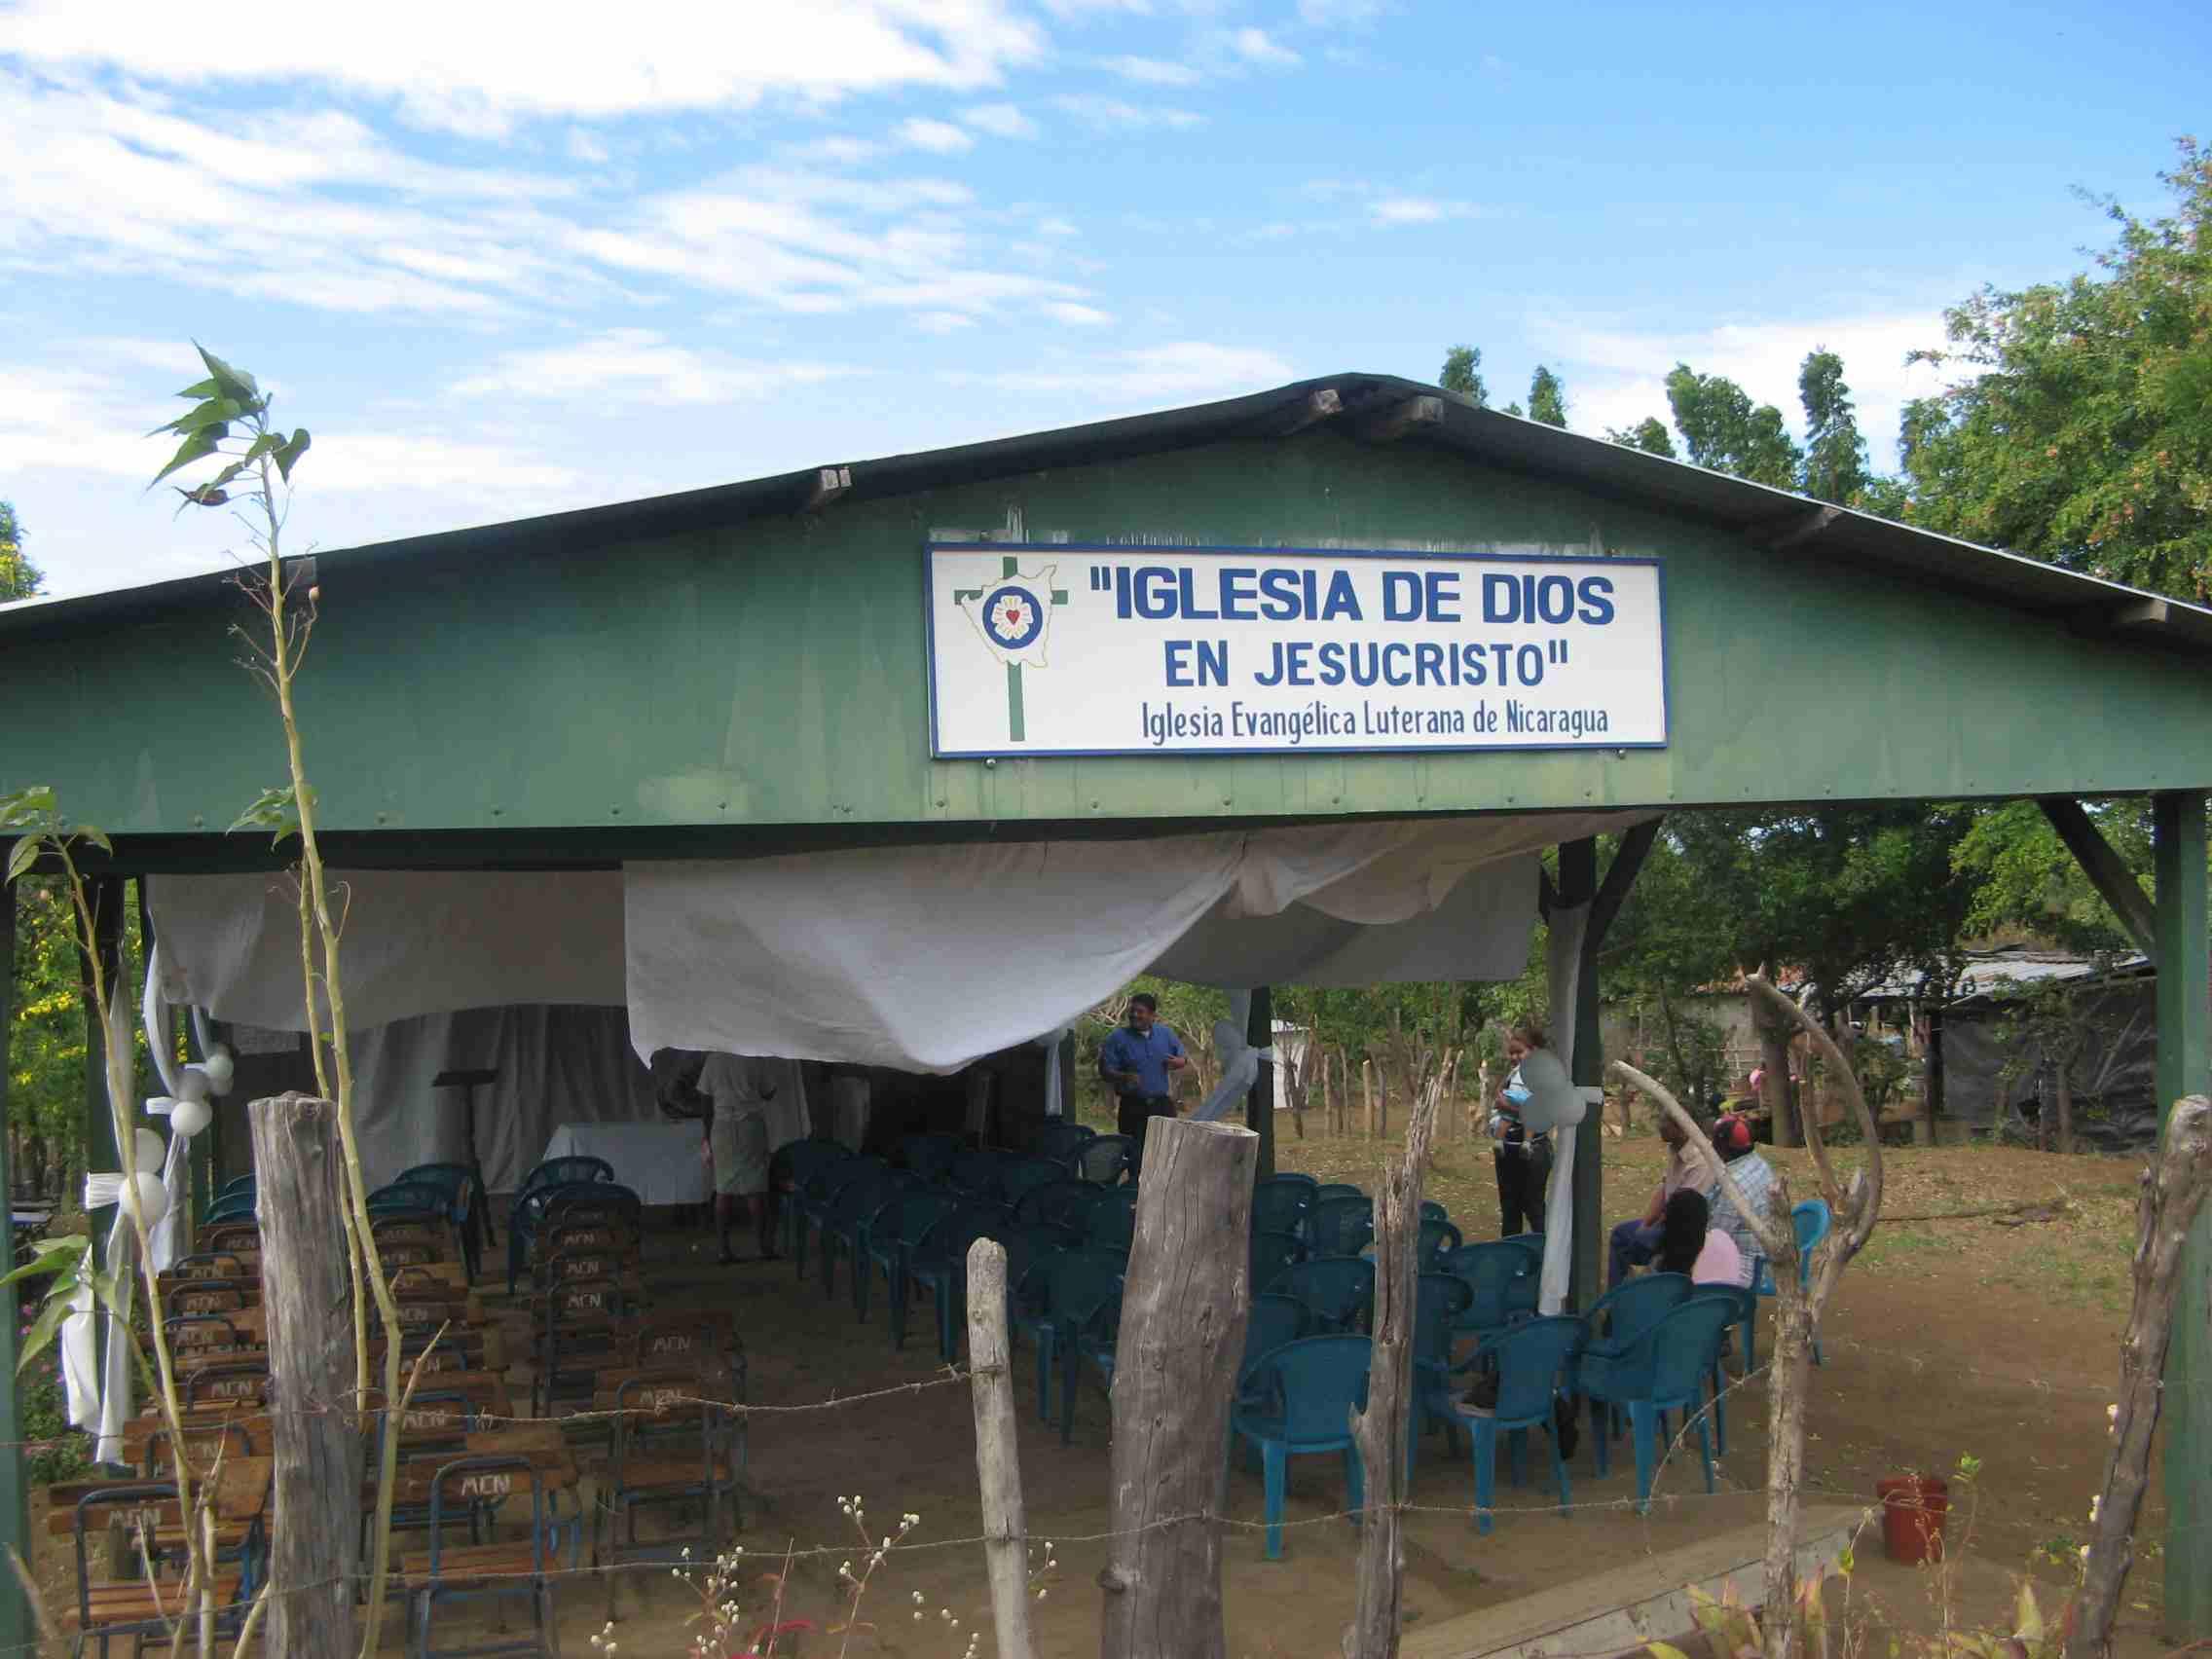 Ranchero, the first worship facility in La Joya